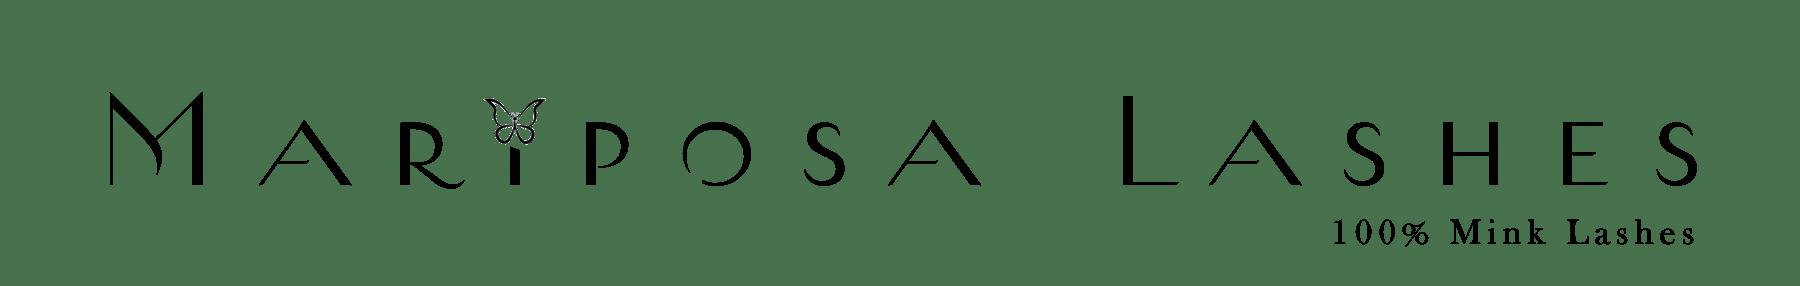 Mariposa Lashes